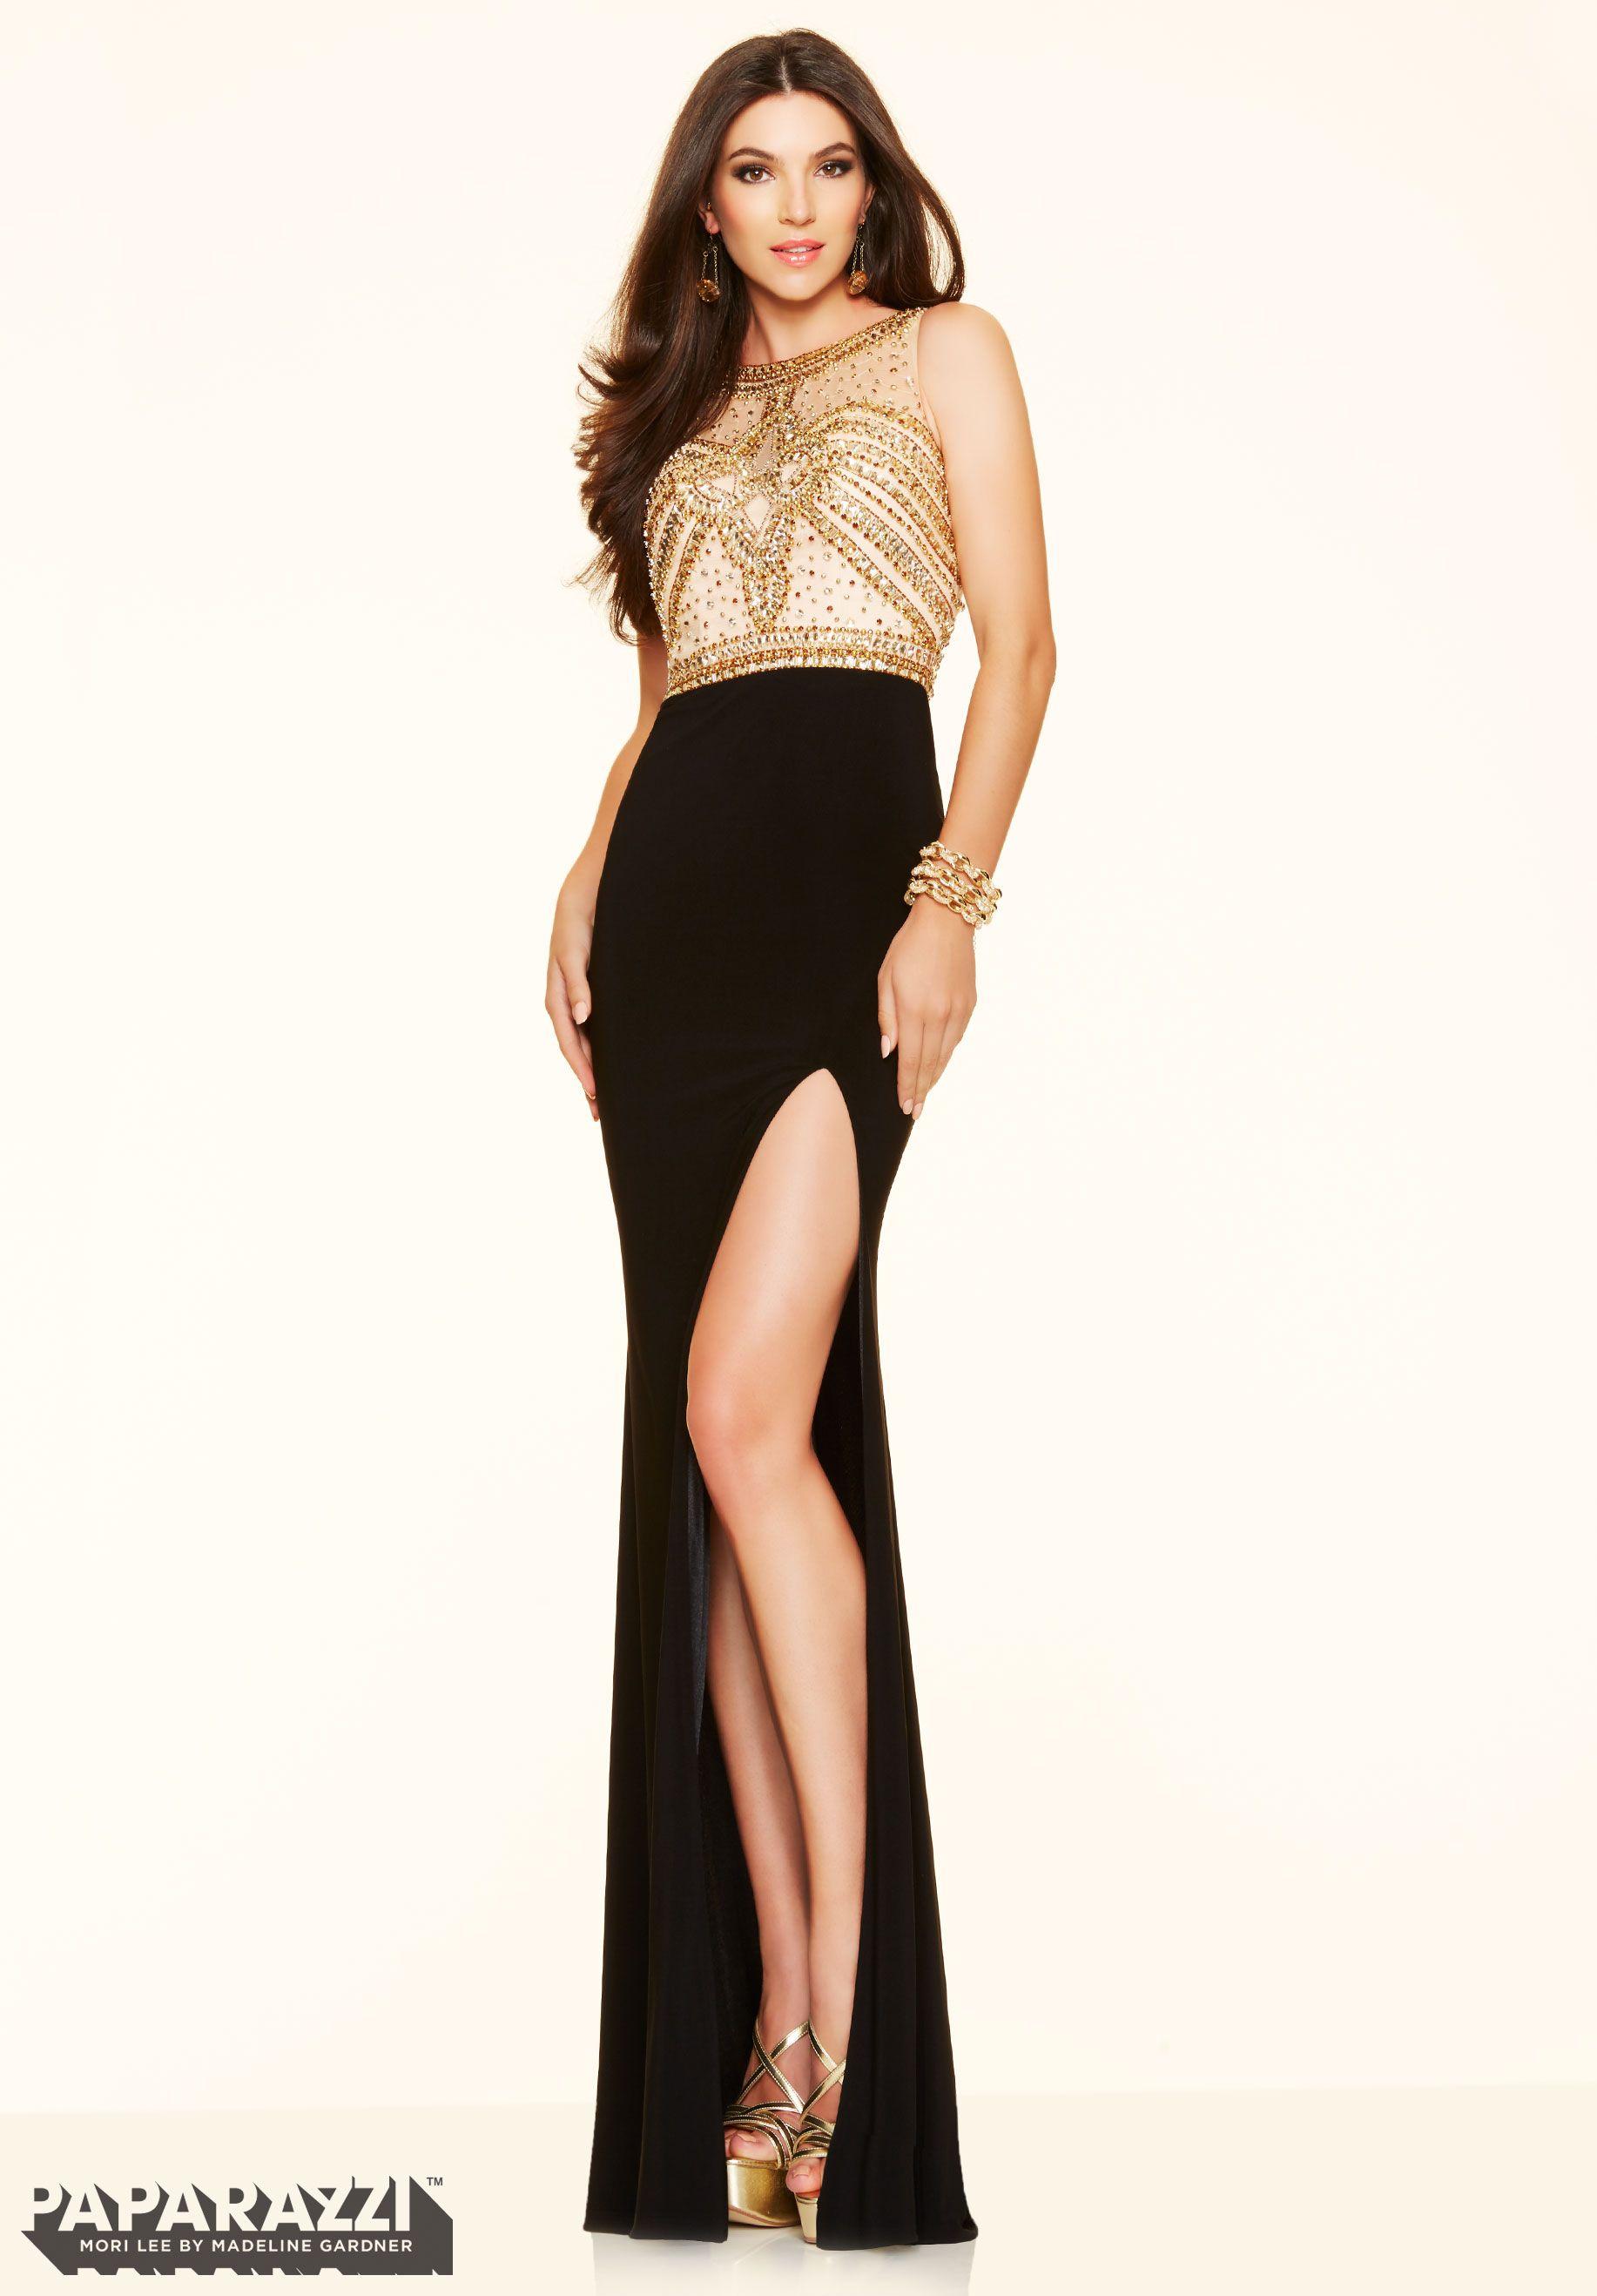 New Jersey Prom Dresses - Ocodea.com